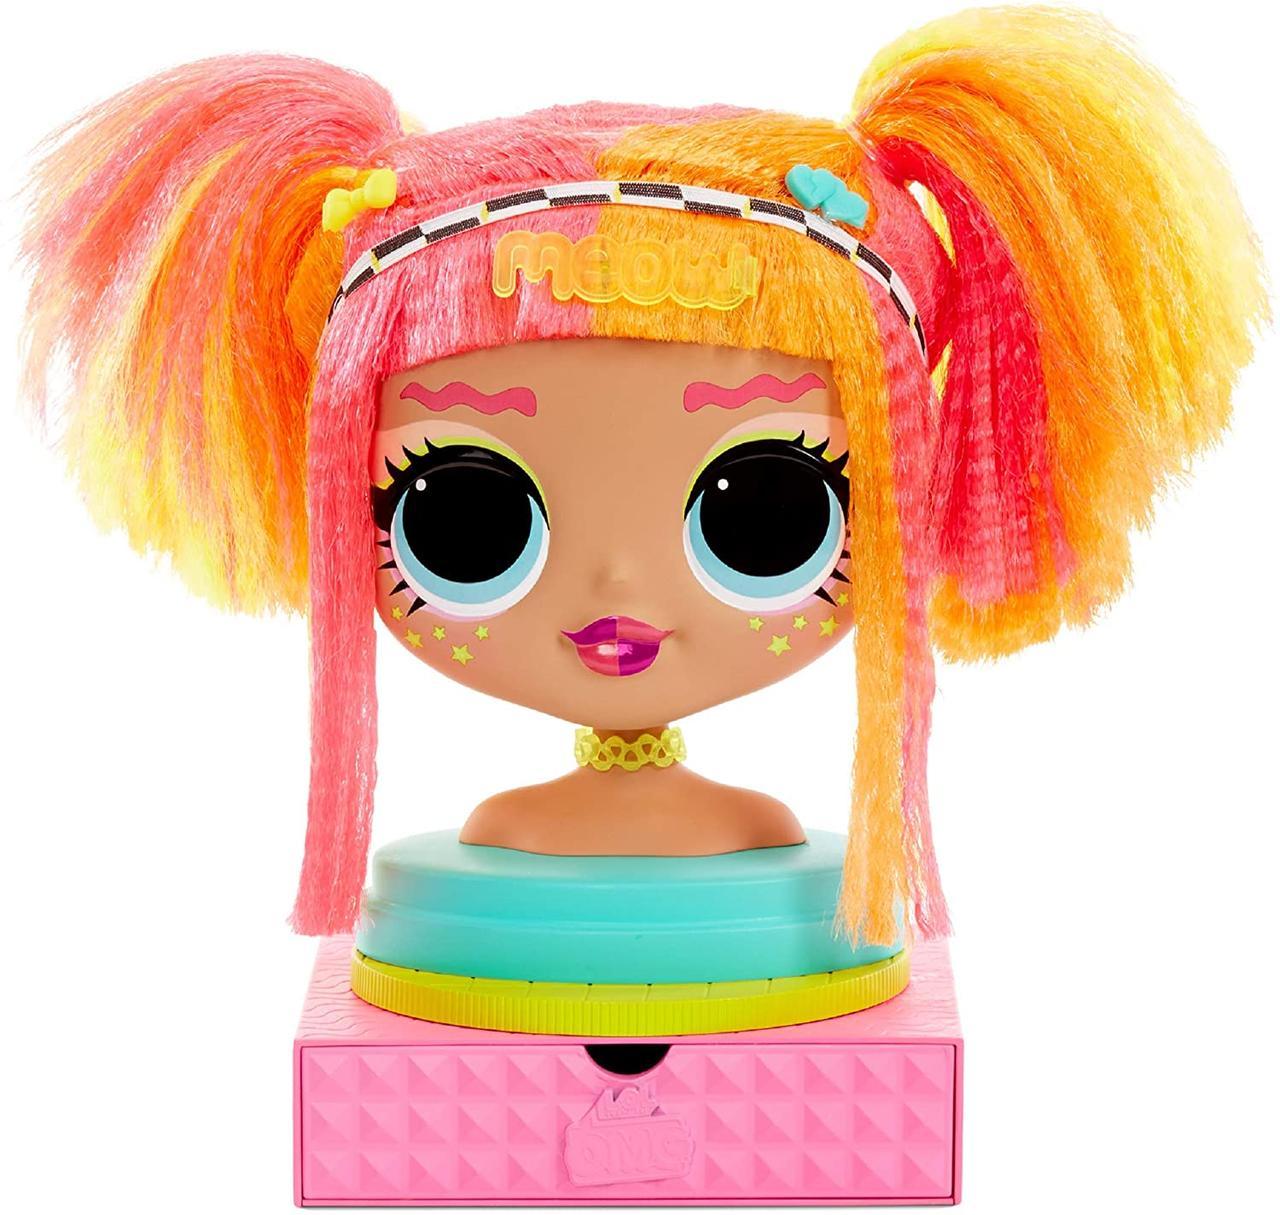 Игровой набор L.O.L. Surprise! Кукла-Манекен Оригинал ЛоЛ - Леди Неон с аксессуарами (565963)